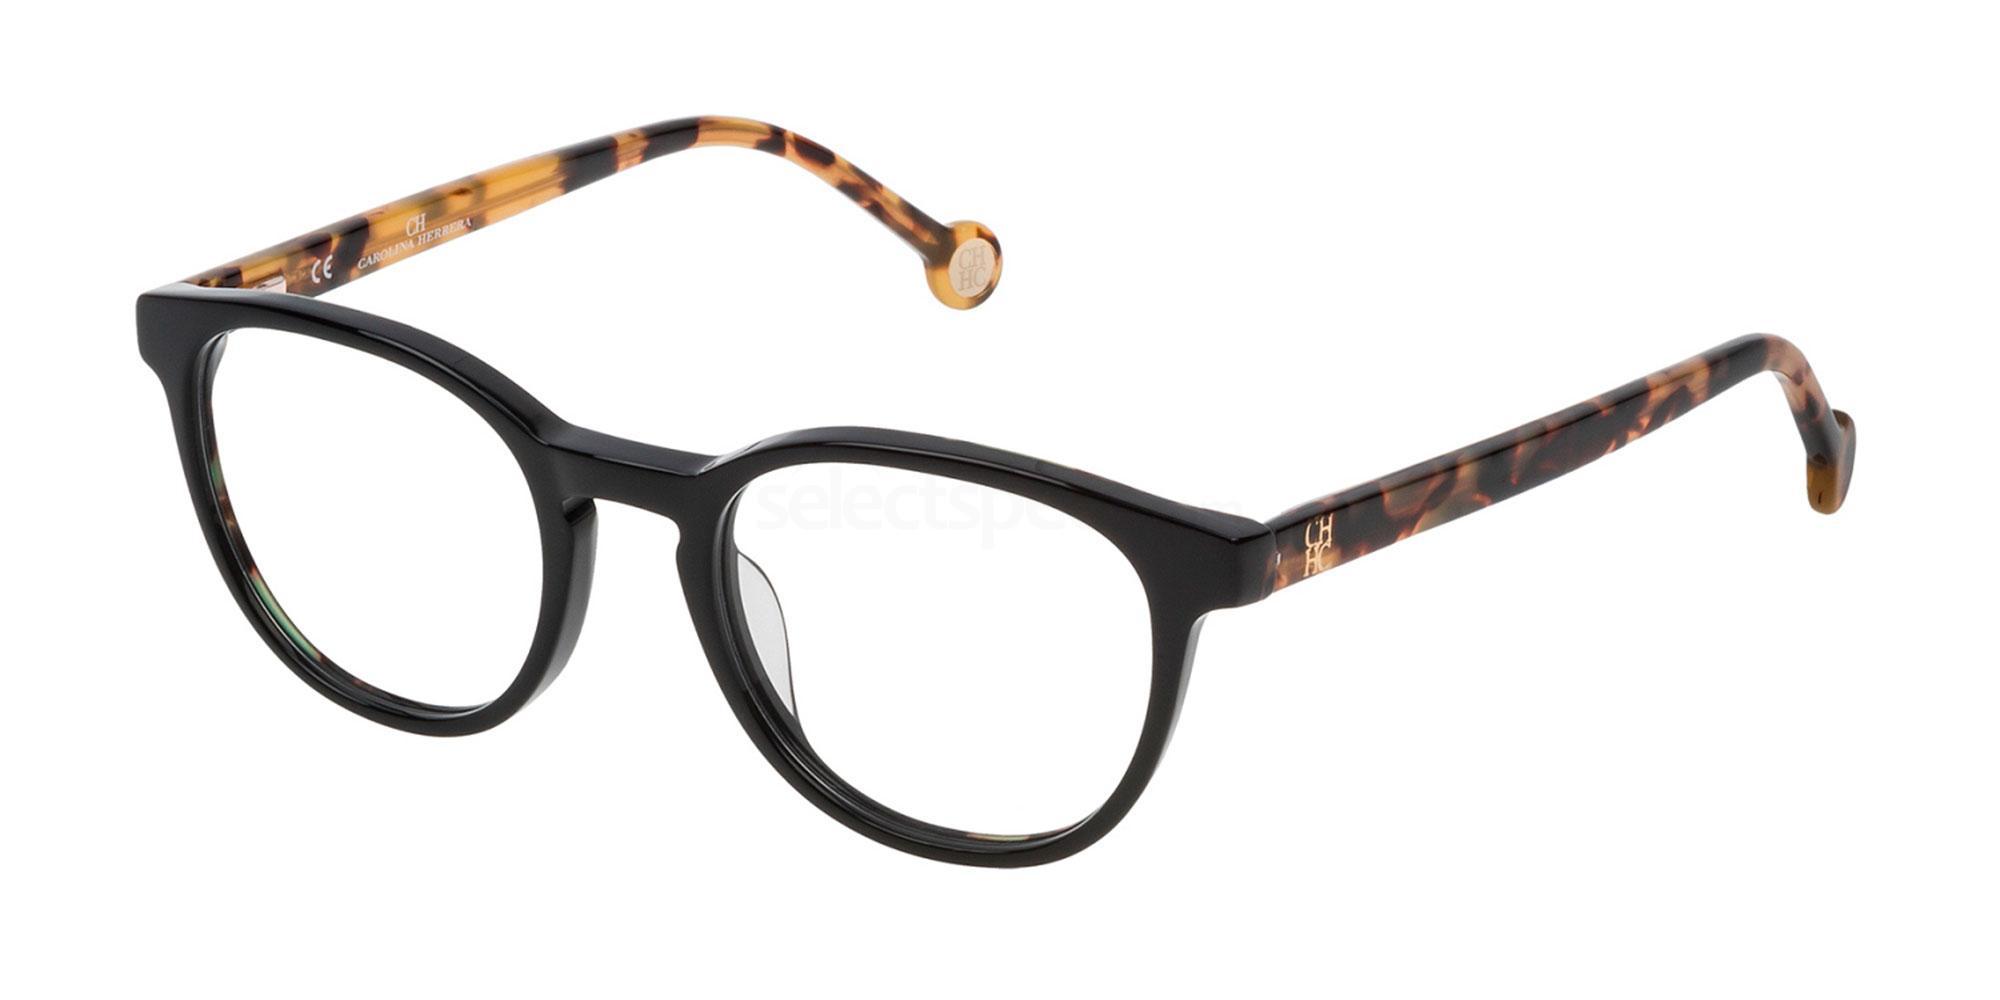 0700 VHE715 Glasses, CH Carolina Herrera